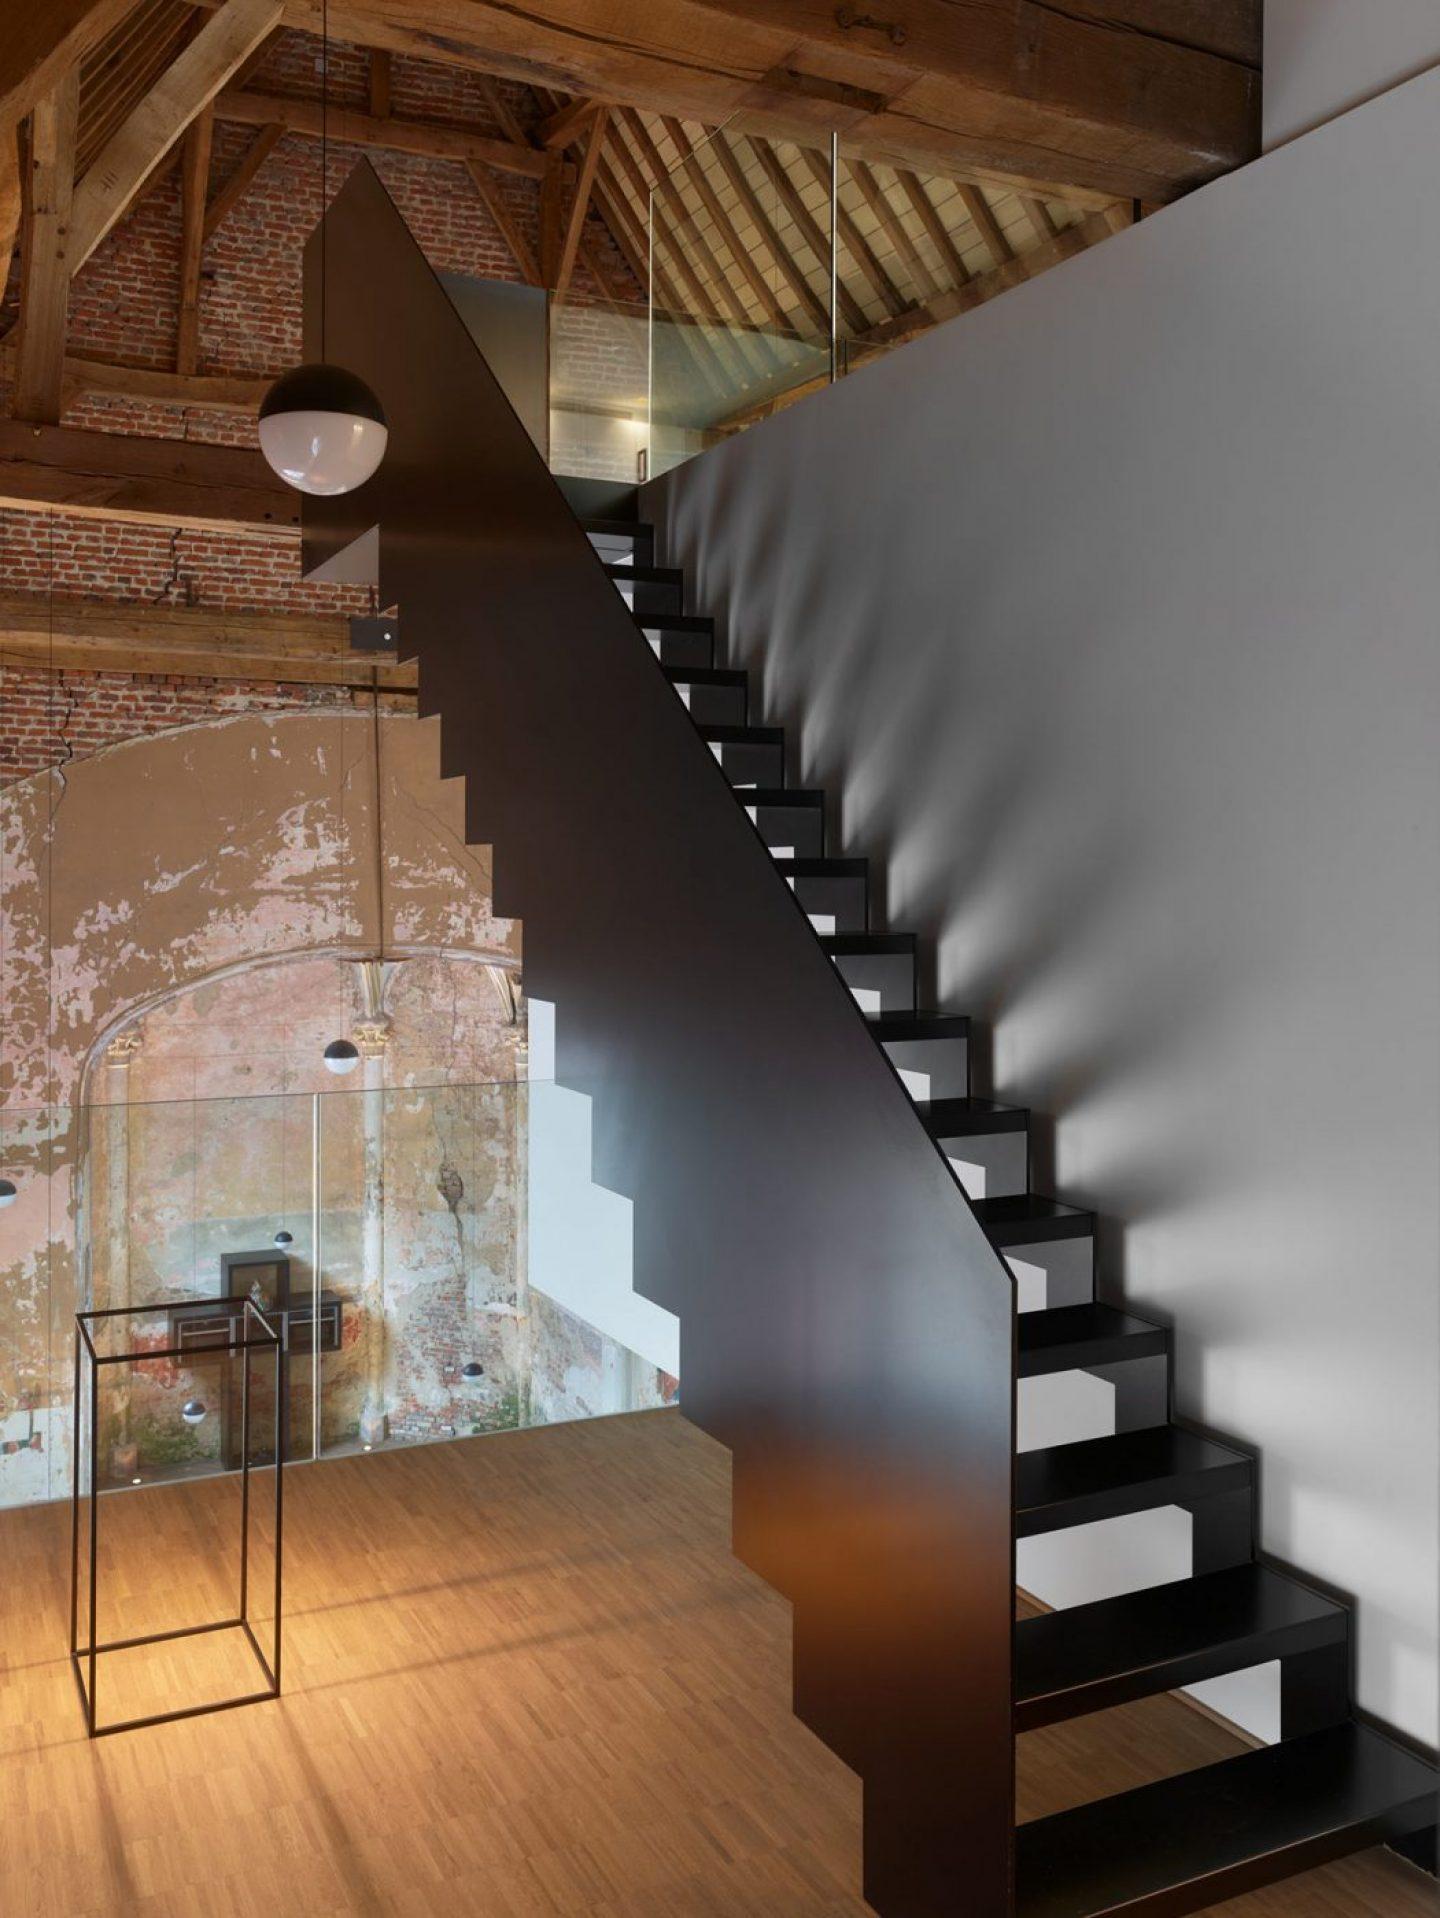 iGNANT-Architecture-The-Waterdog-Klaarchitectuur-6